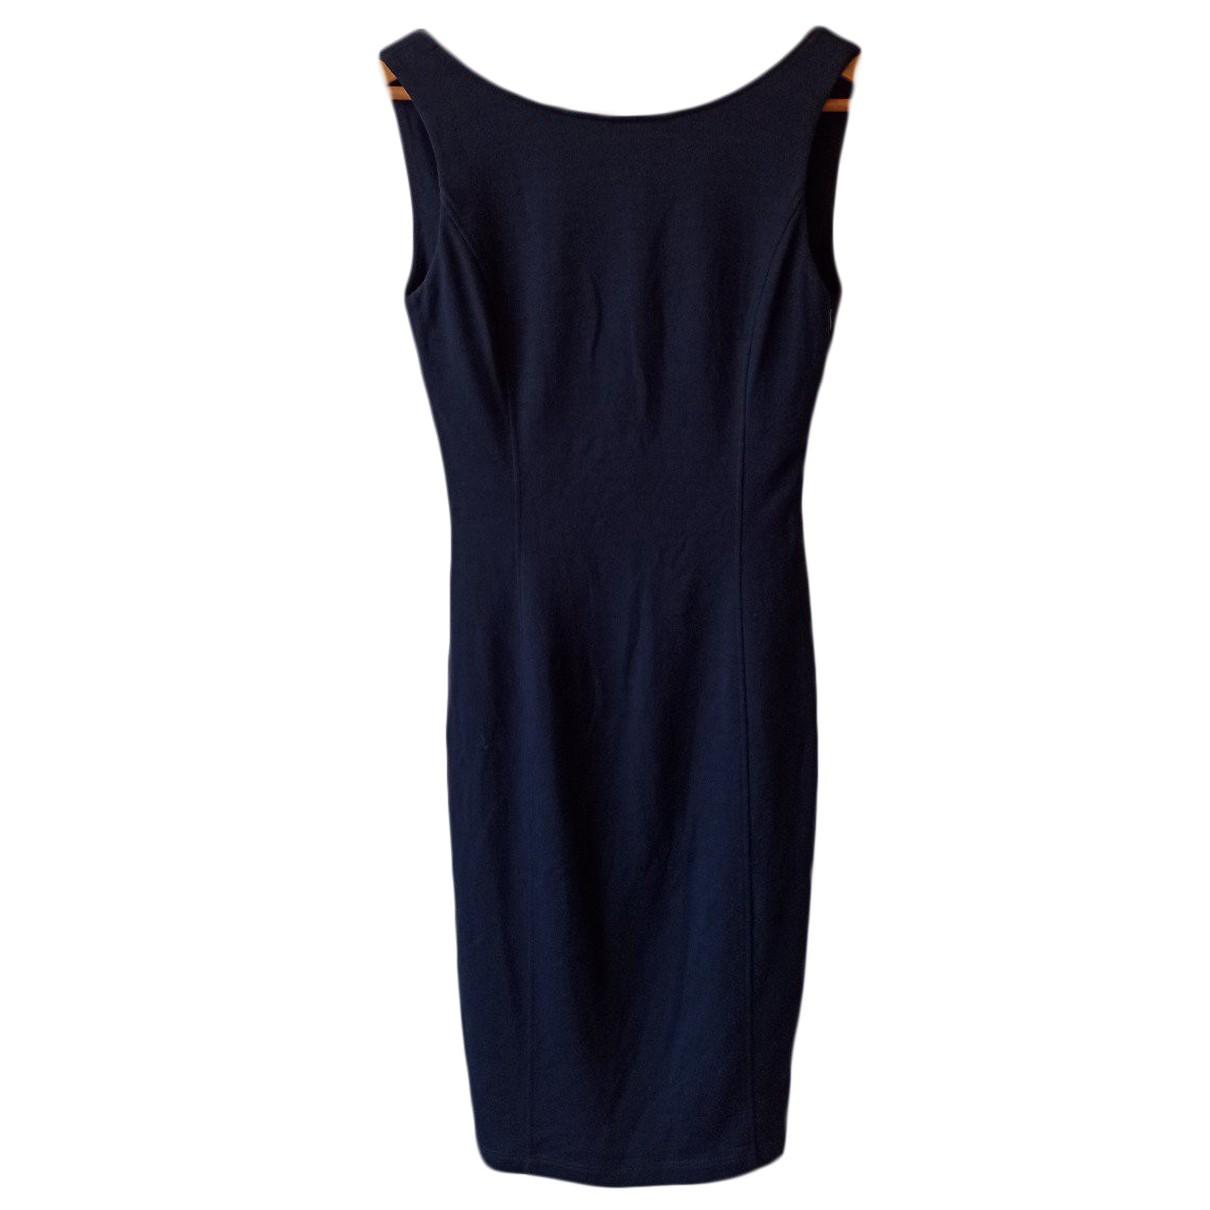 Flavio Castellani \N Kleid in  Blau Wolle